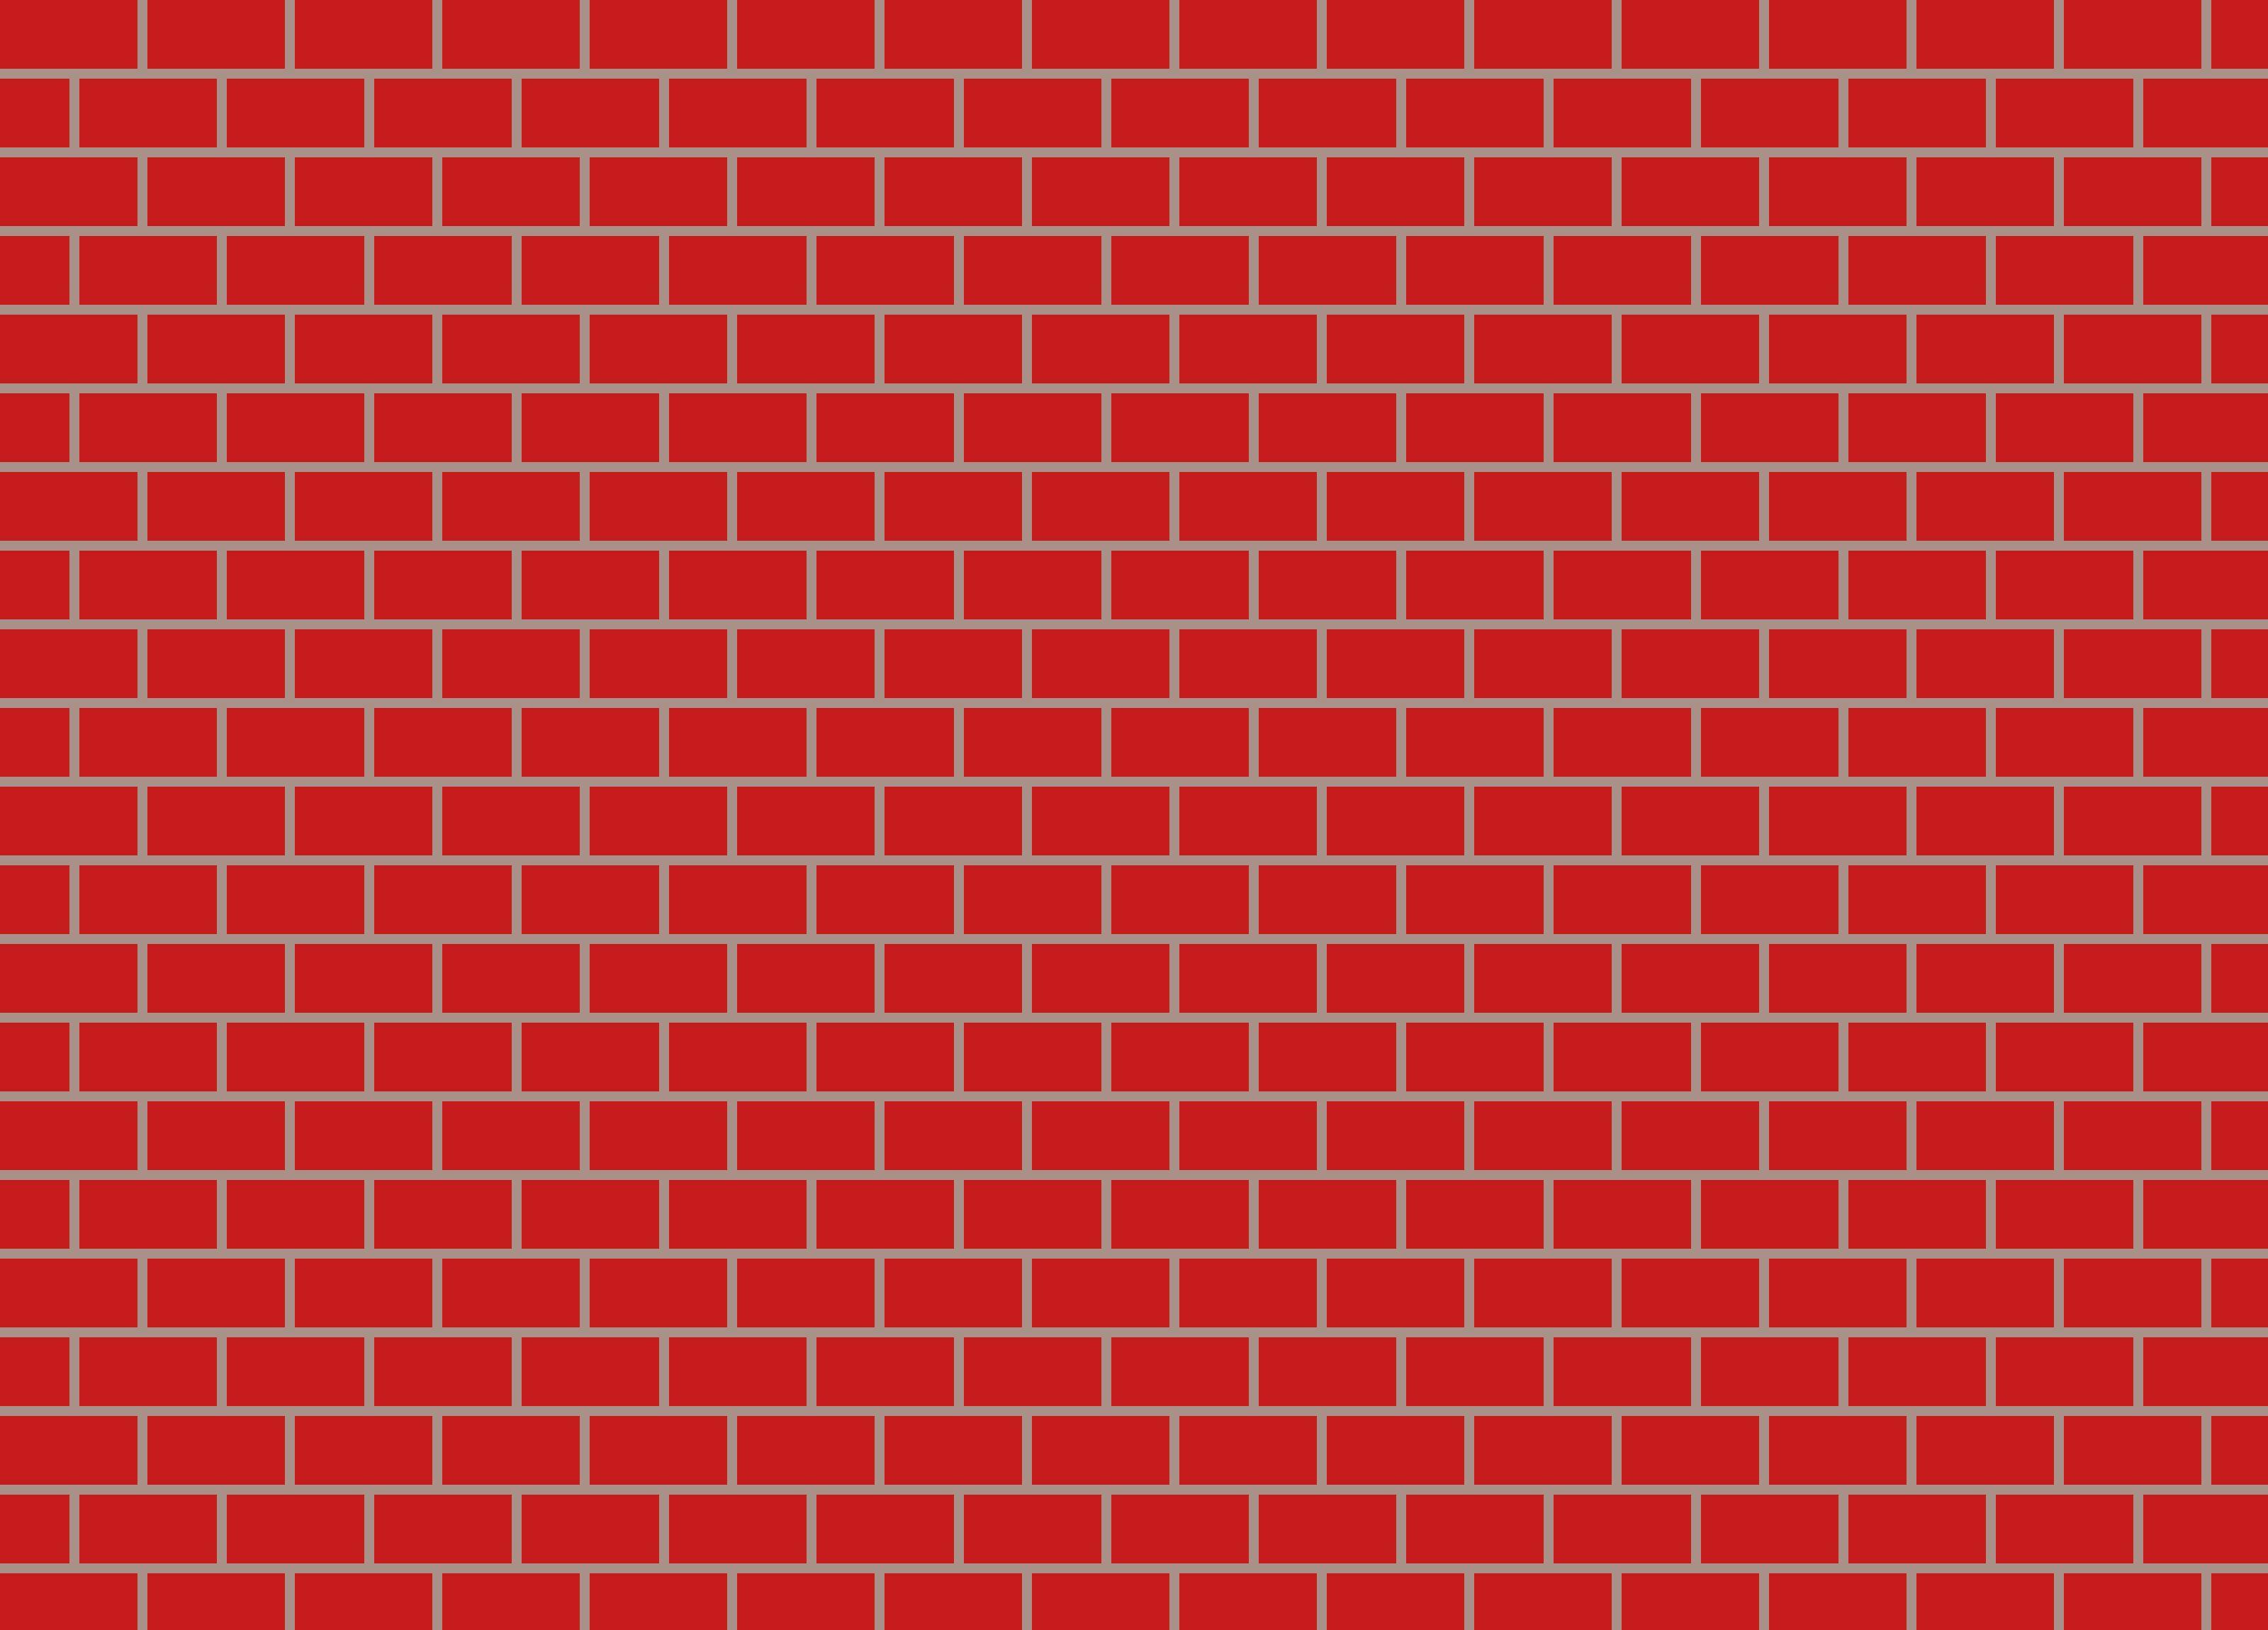 Wall clip art pinterest. Brick clipart red brick